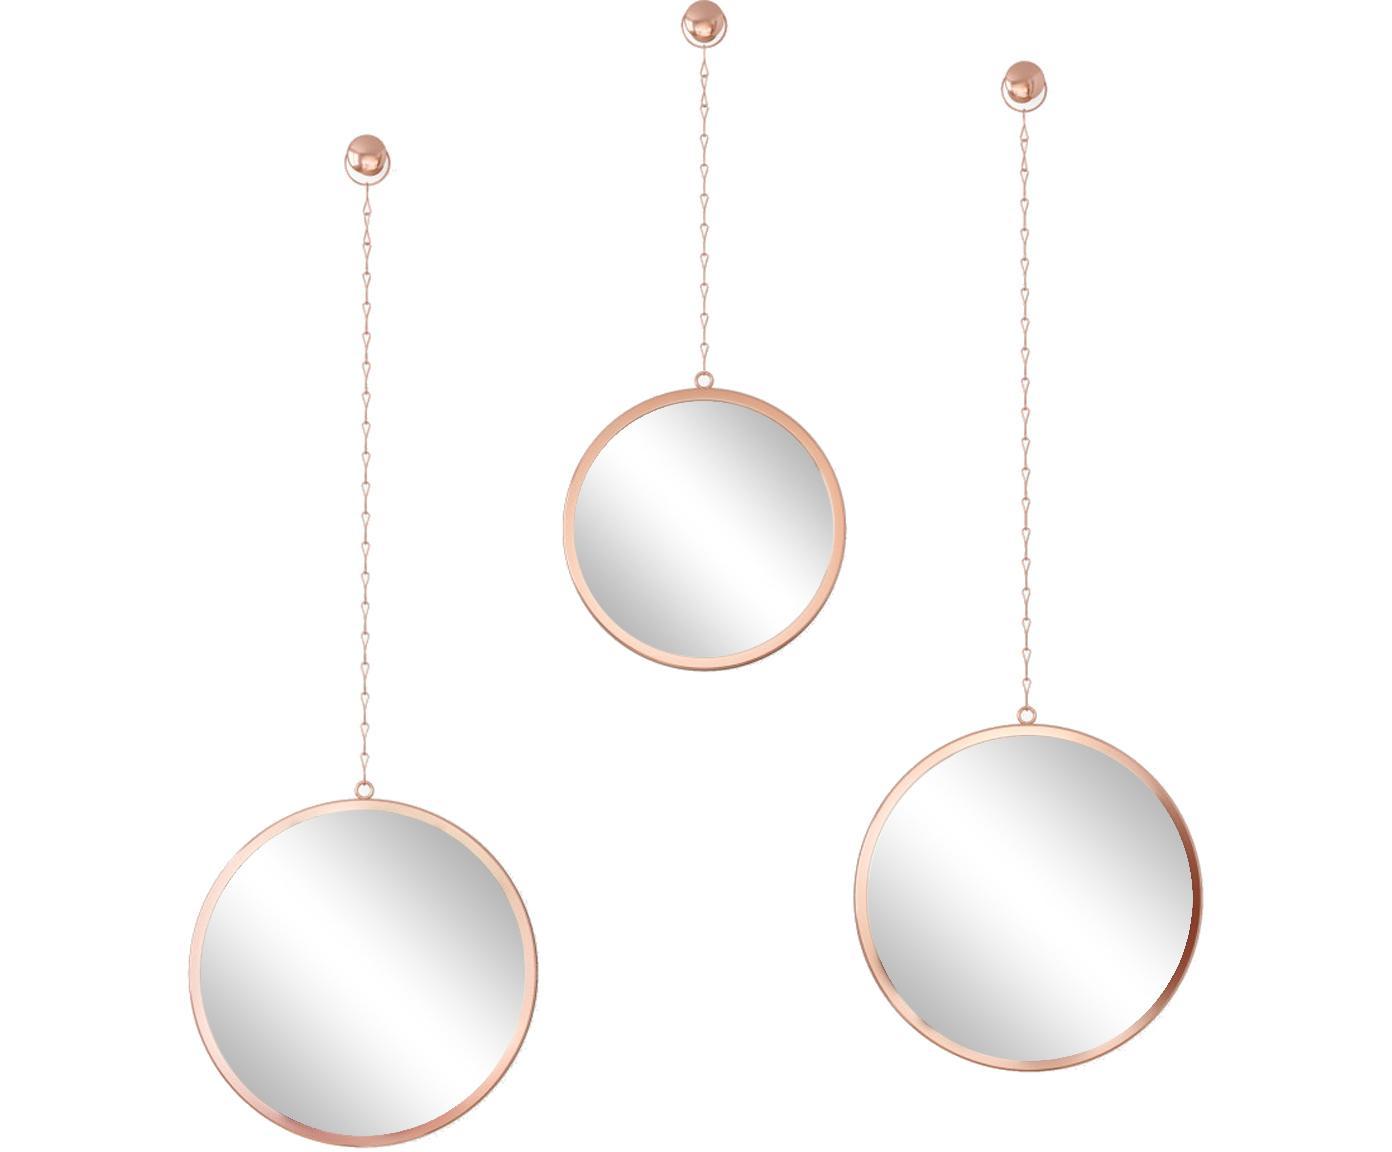 Set de espejos de pared Dima, 3pzas., Espejo: cristal, Bronce, Tamaños diferentes